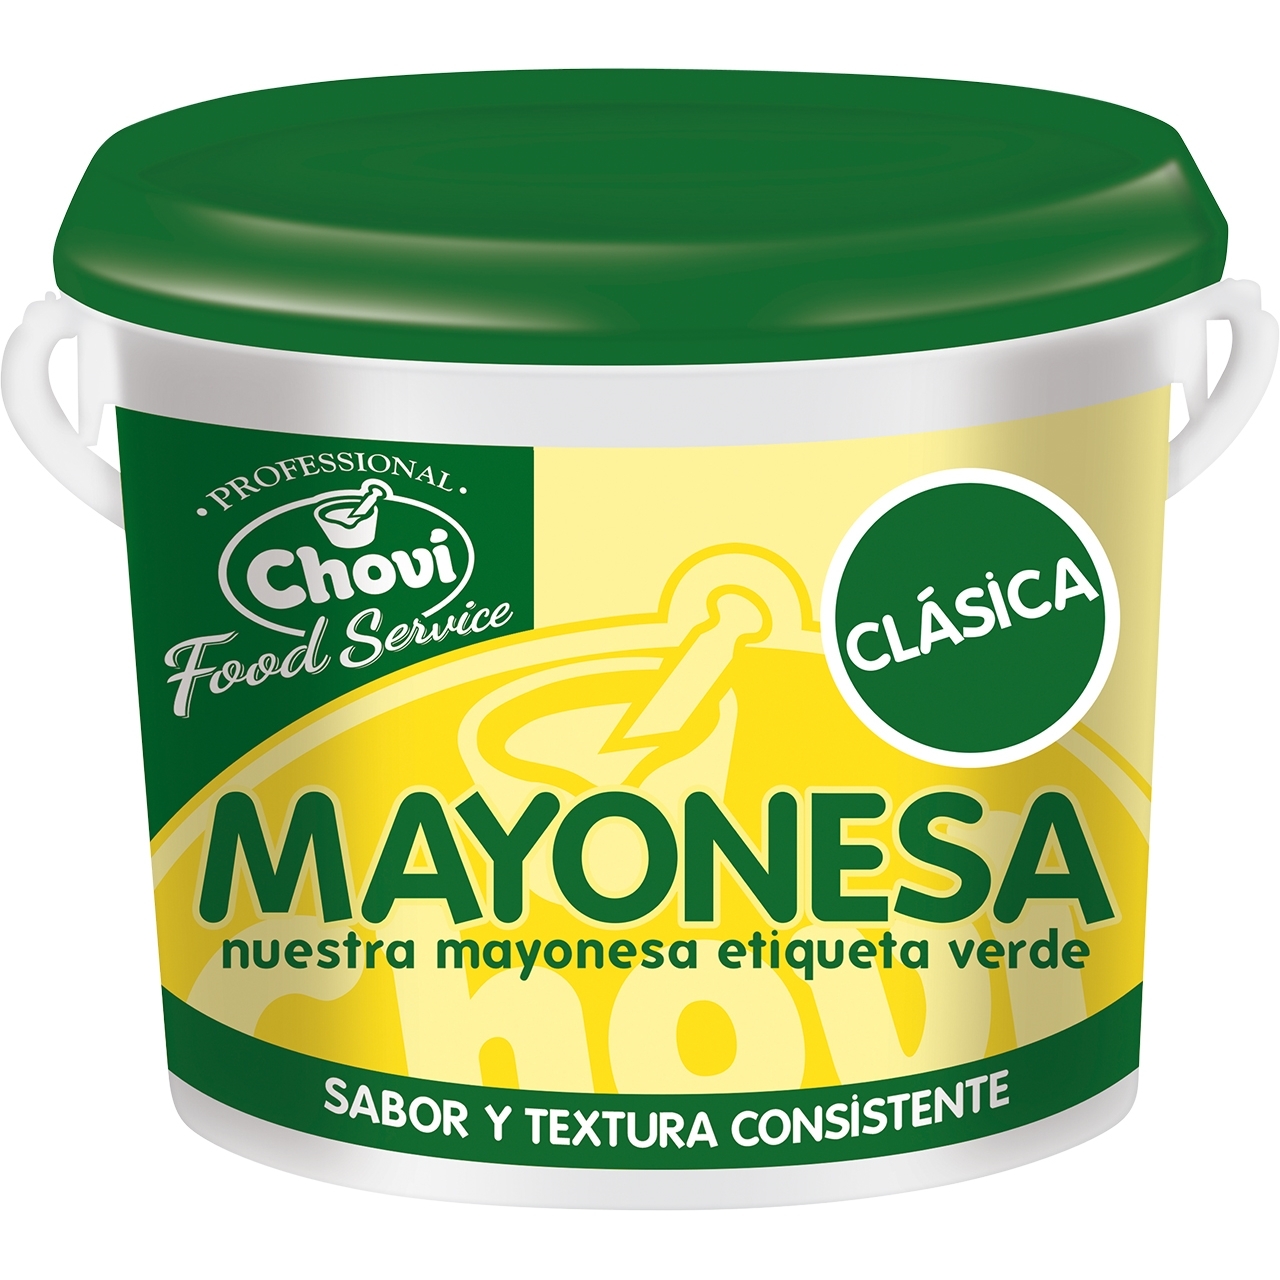 Maionesa Clàssica 5kg. Choví